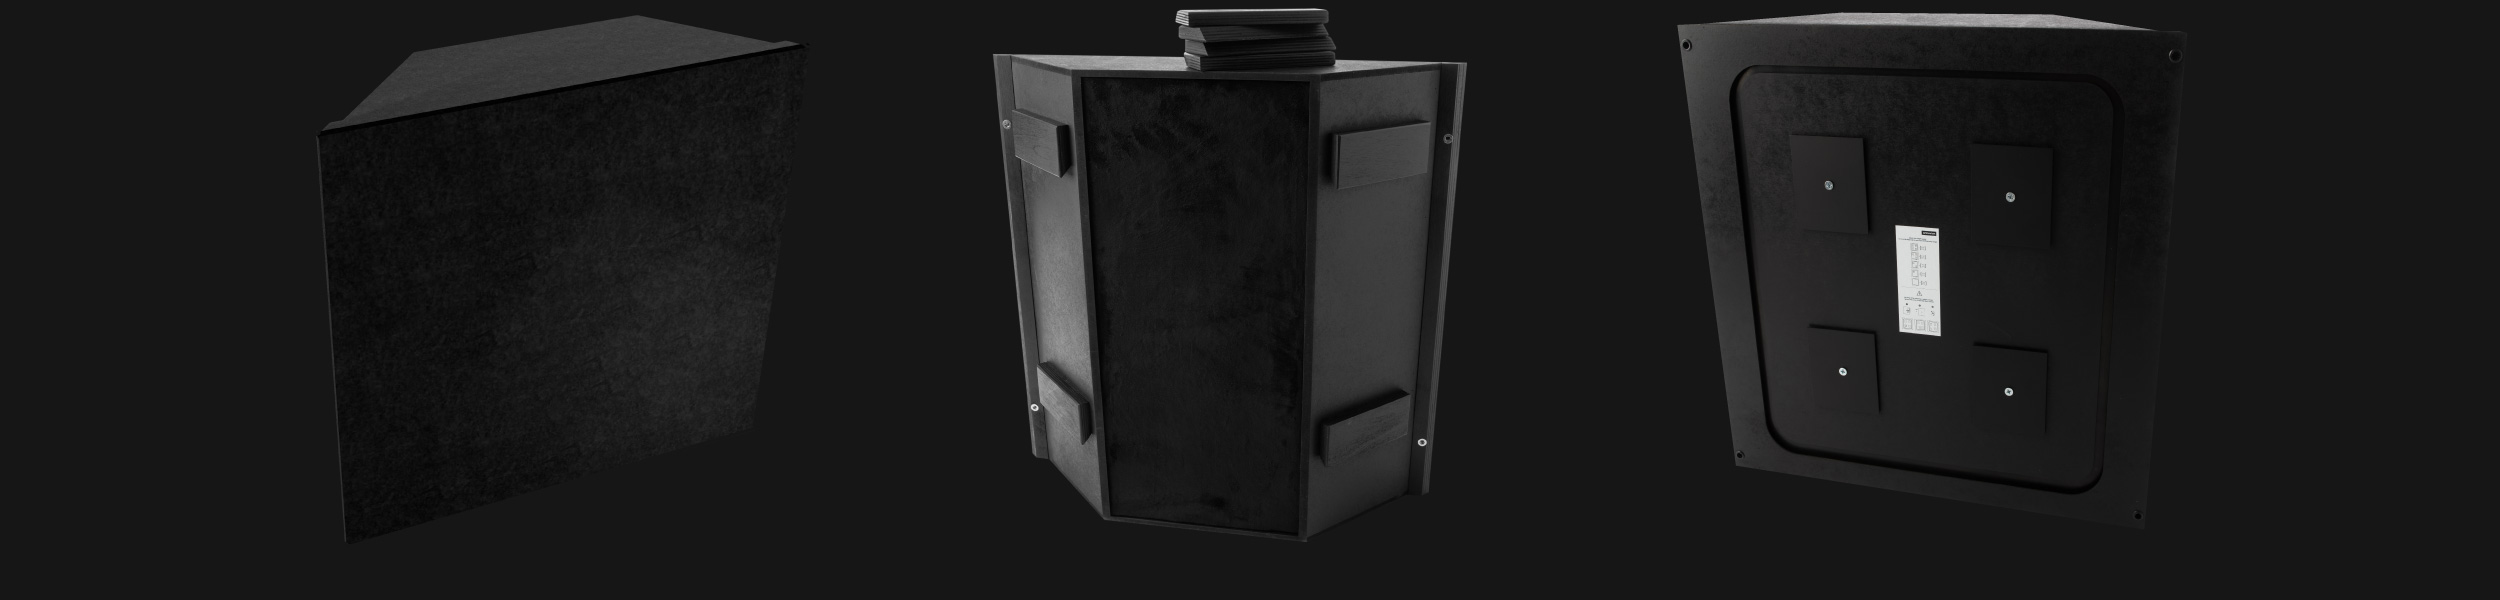 Artnovion product bass trap corner fabric 09c9262657